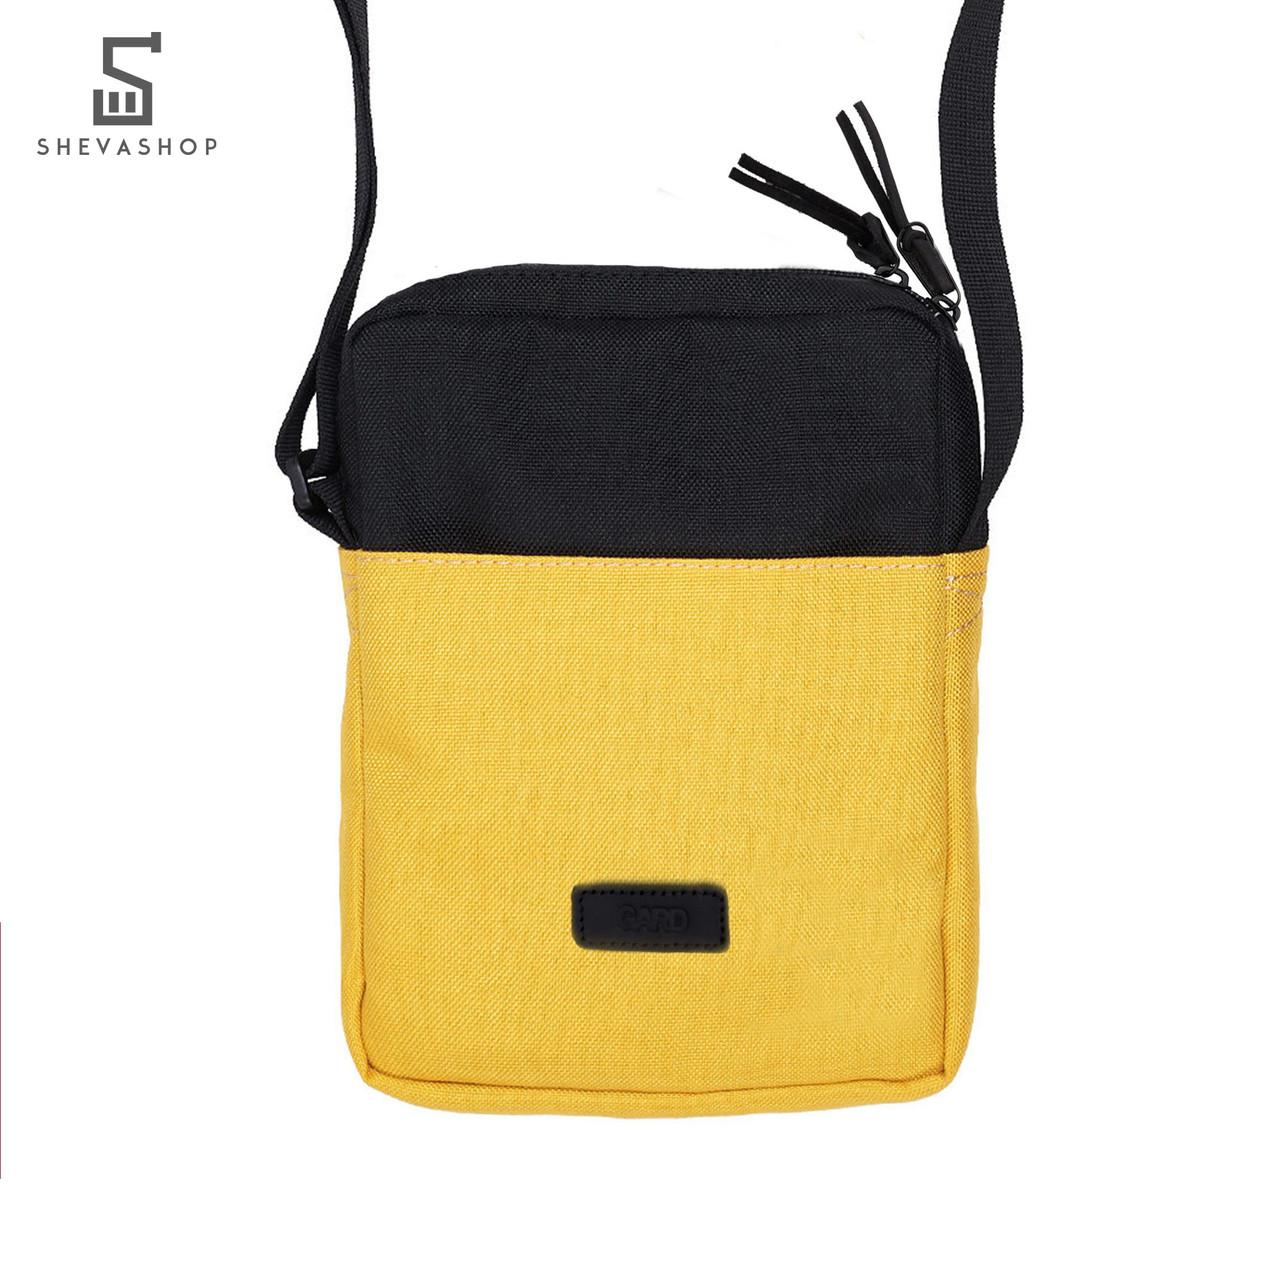 b3460bd1787 Сумка-мессенджер на плечо Gard желтая